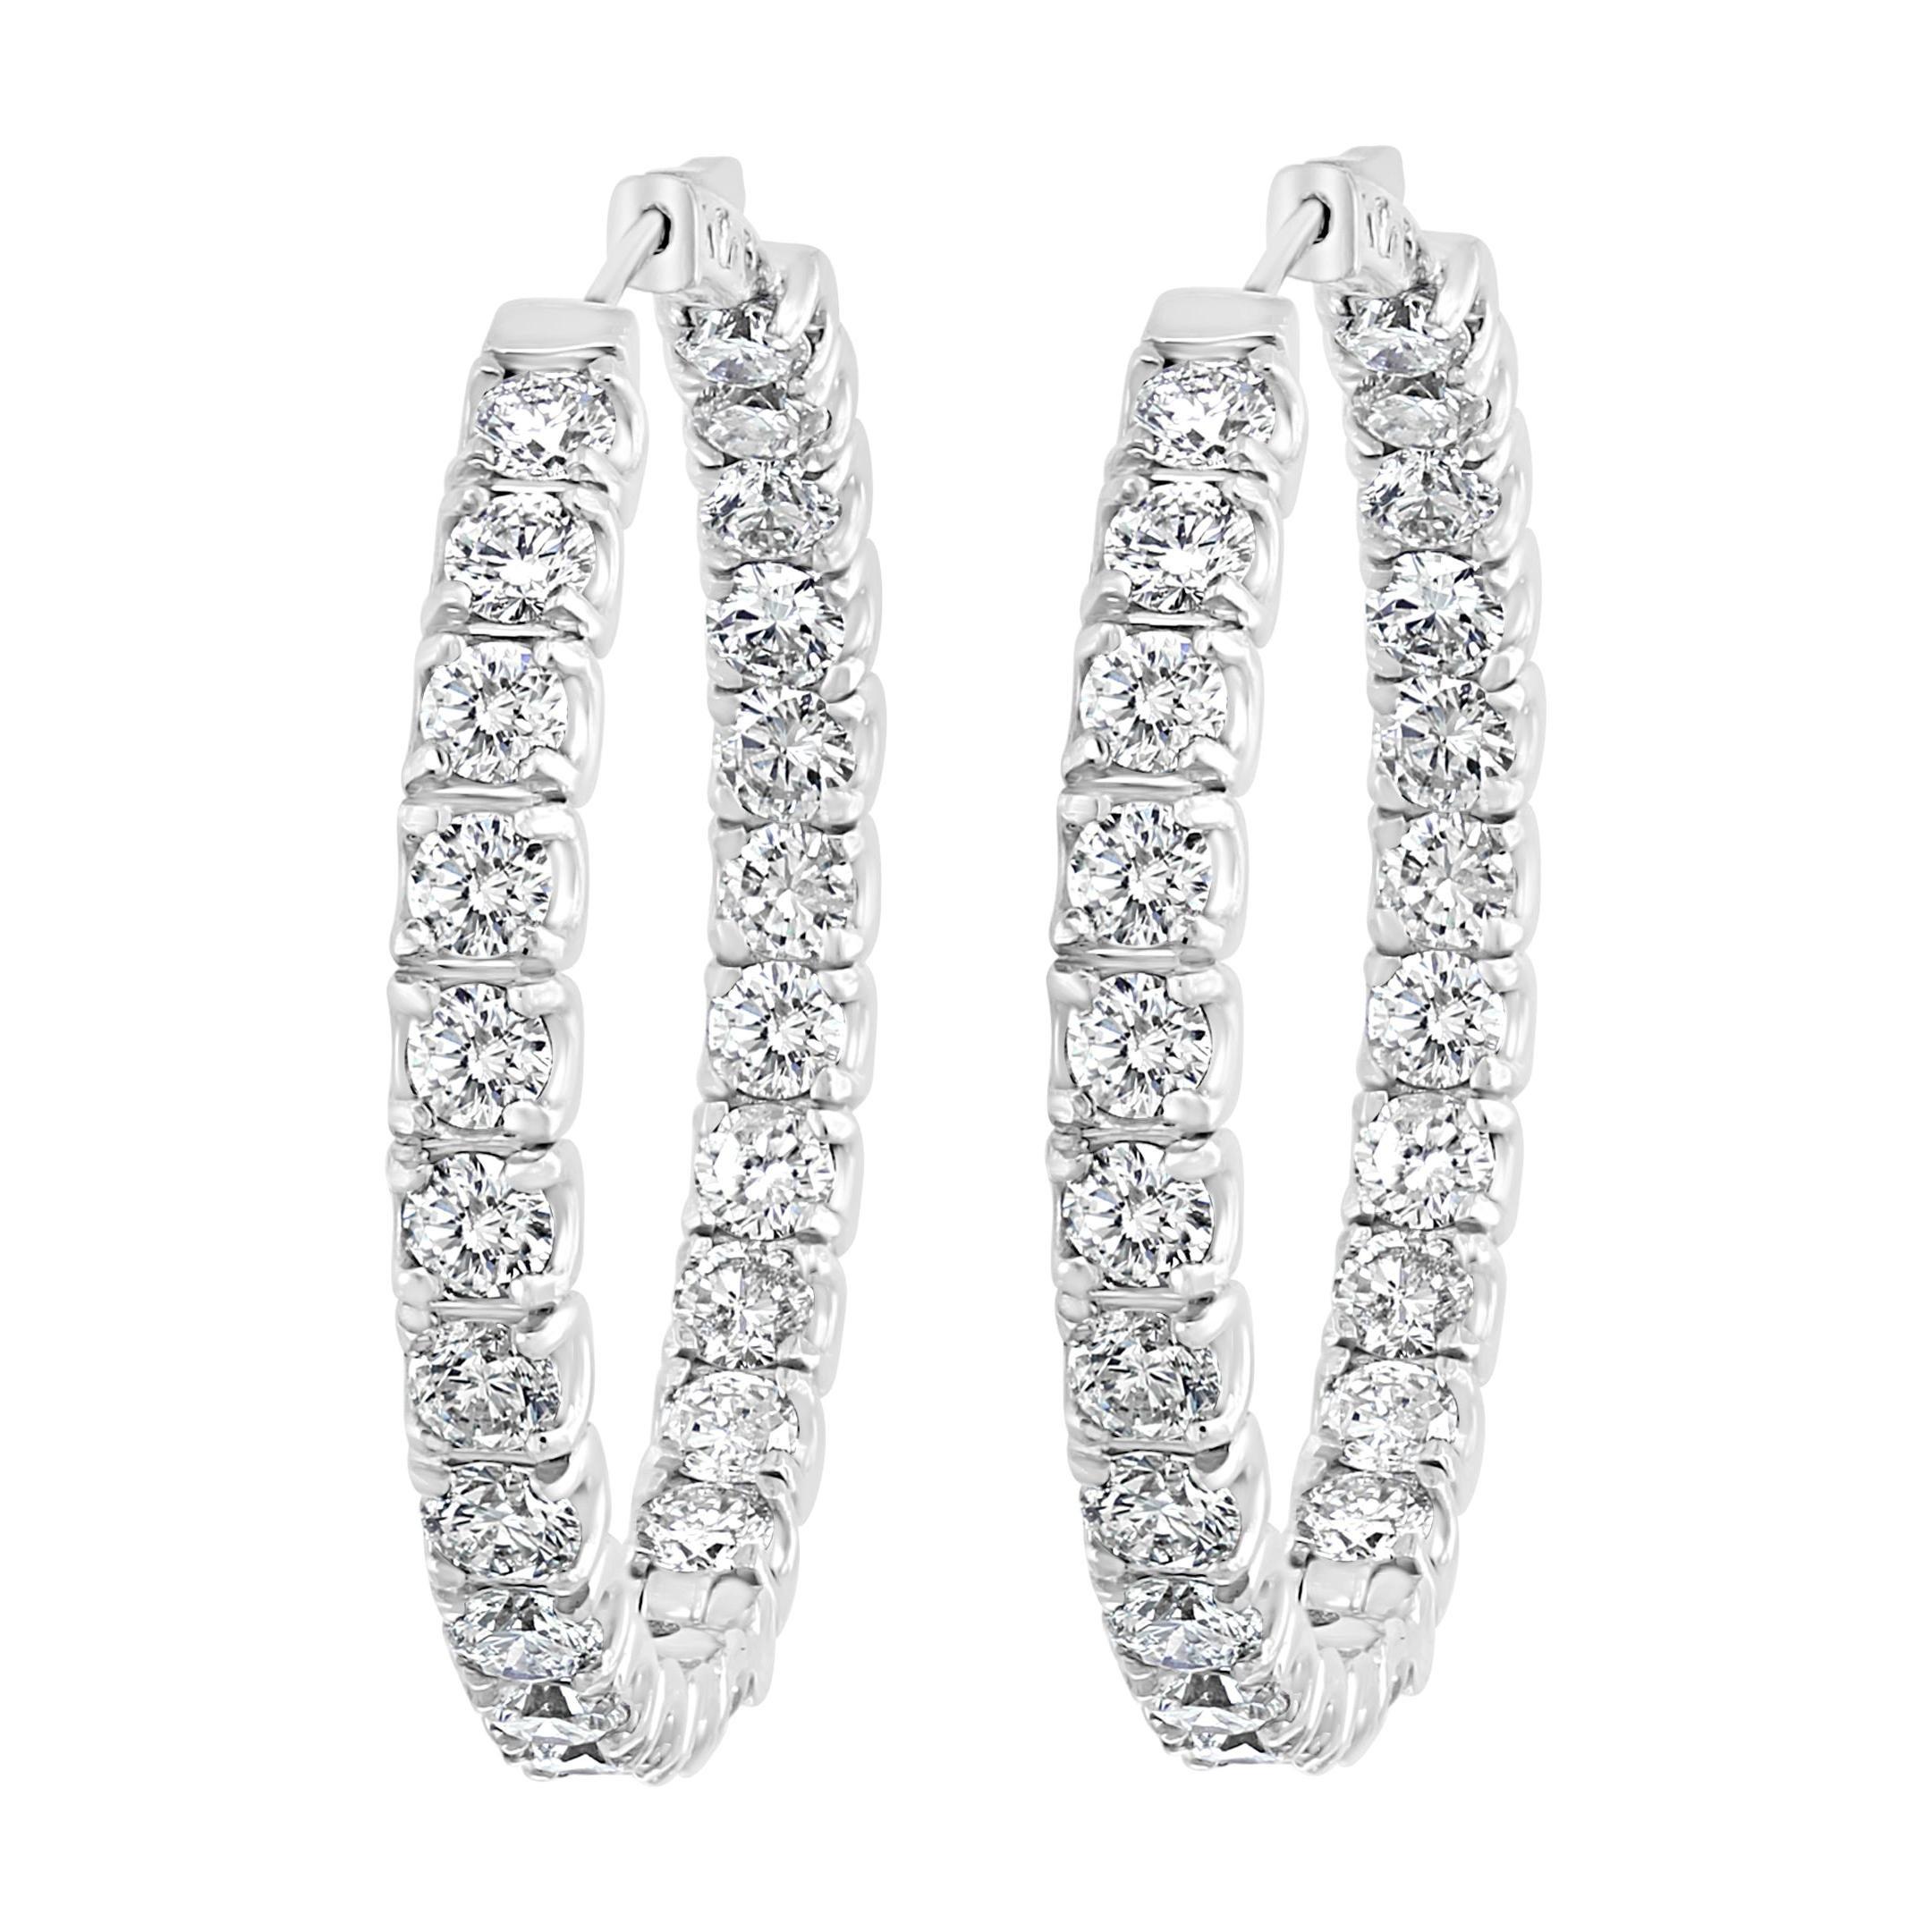 24 Carat, 50 Pointer Each Diamond Inside Out Hoop Earrings 14 Karat White Gold